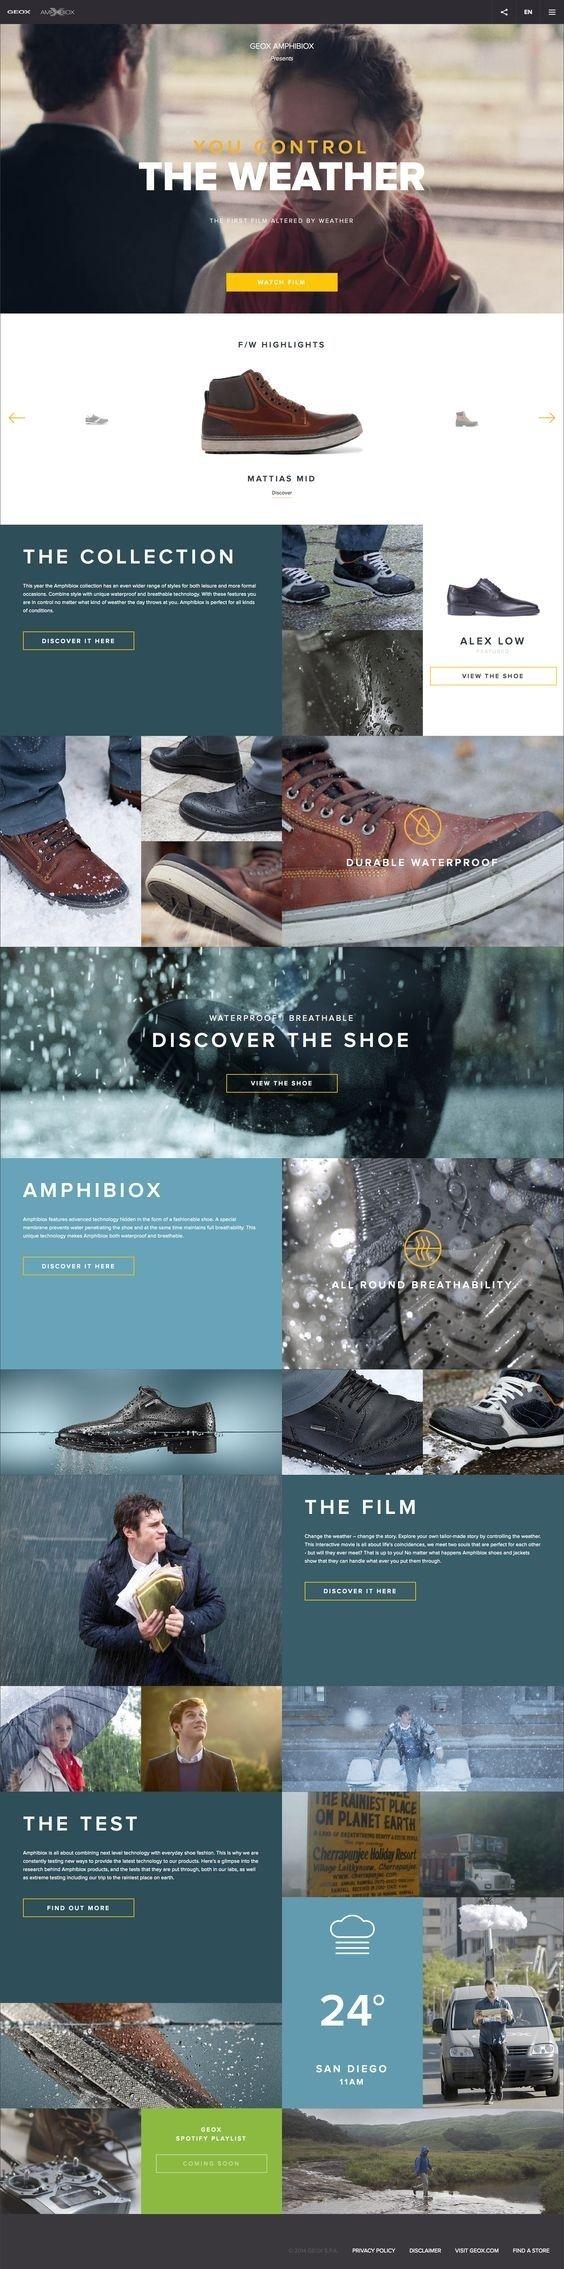 http://designspiration.net/image/5597544065768/